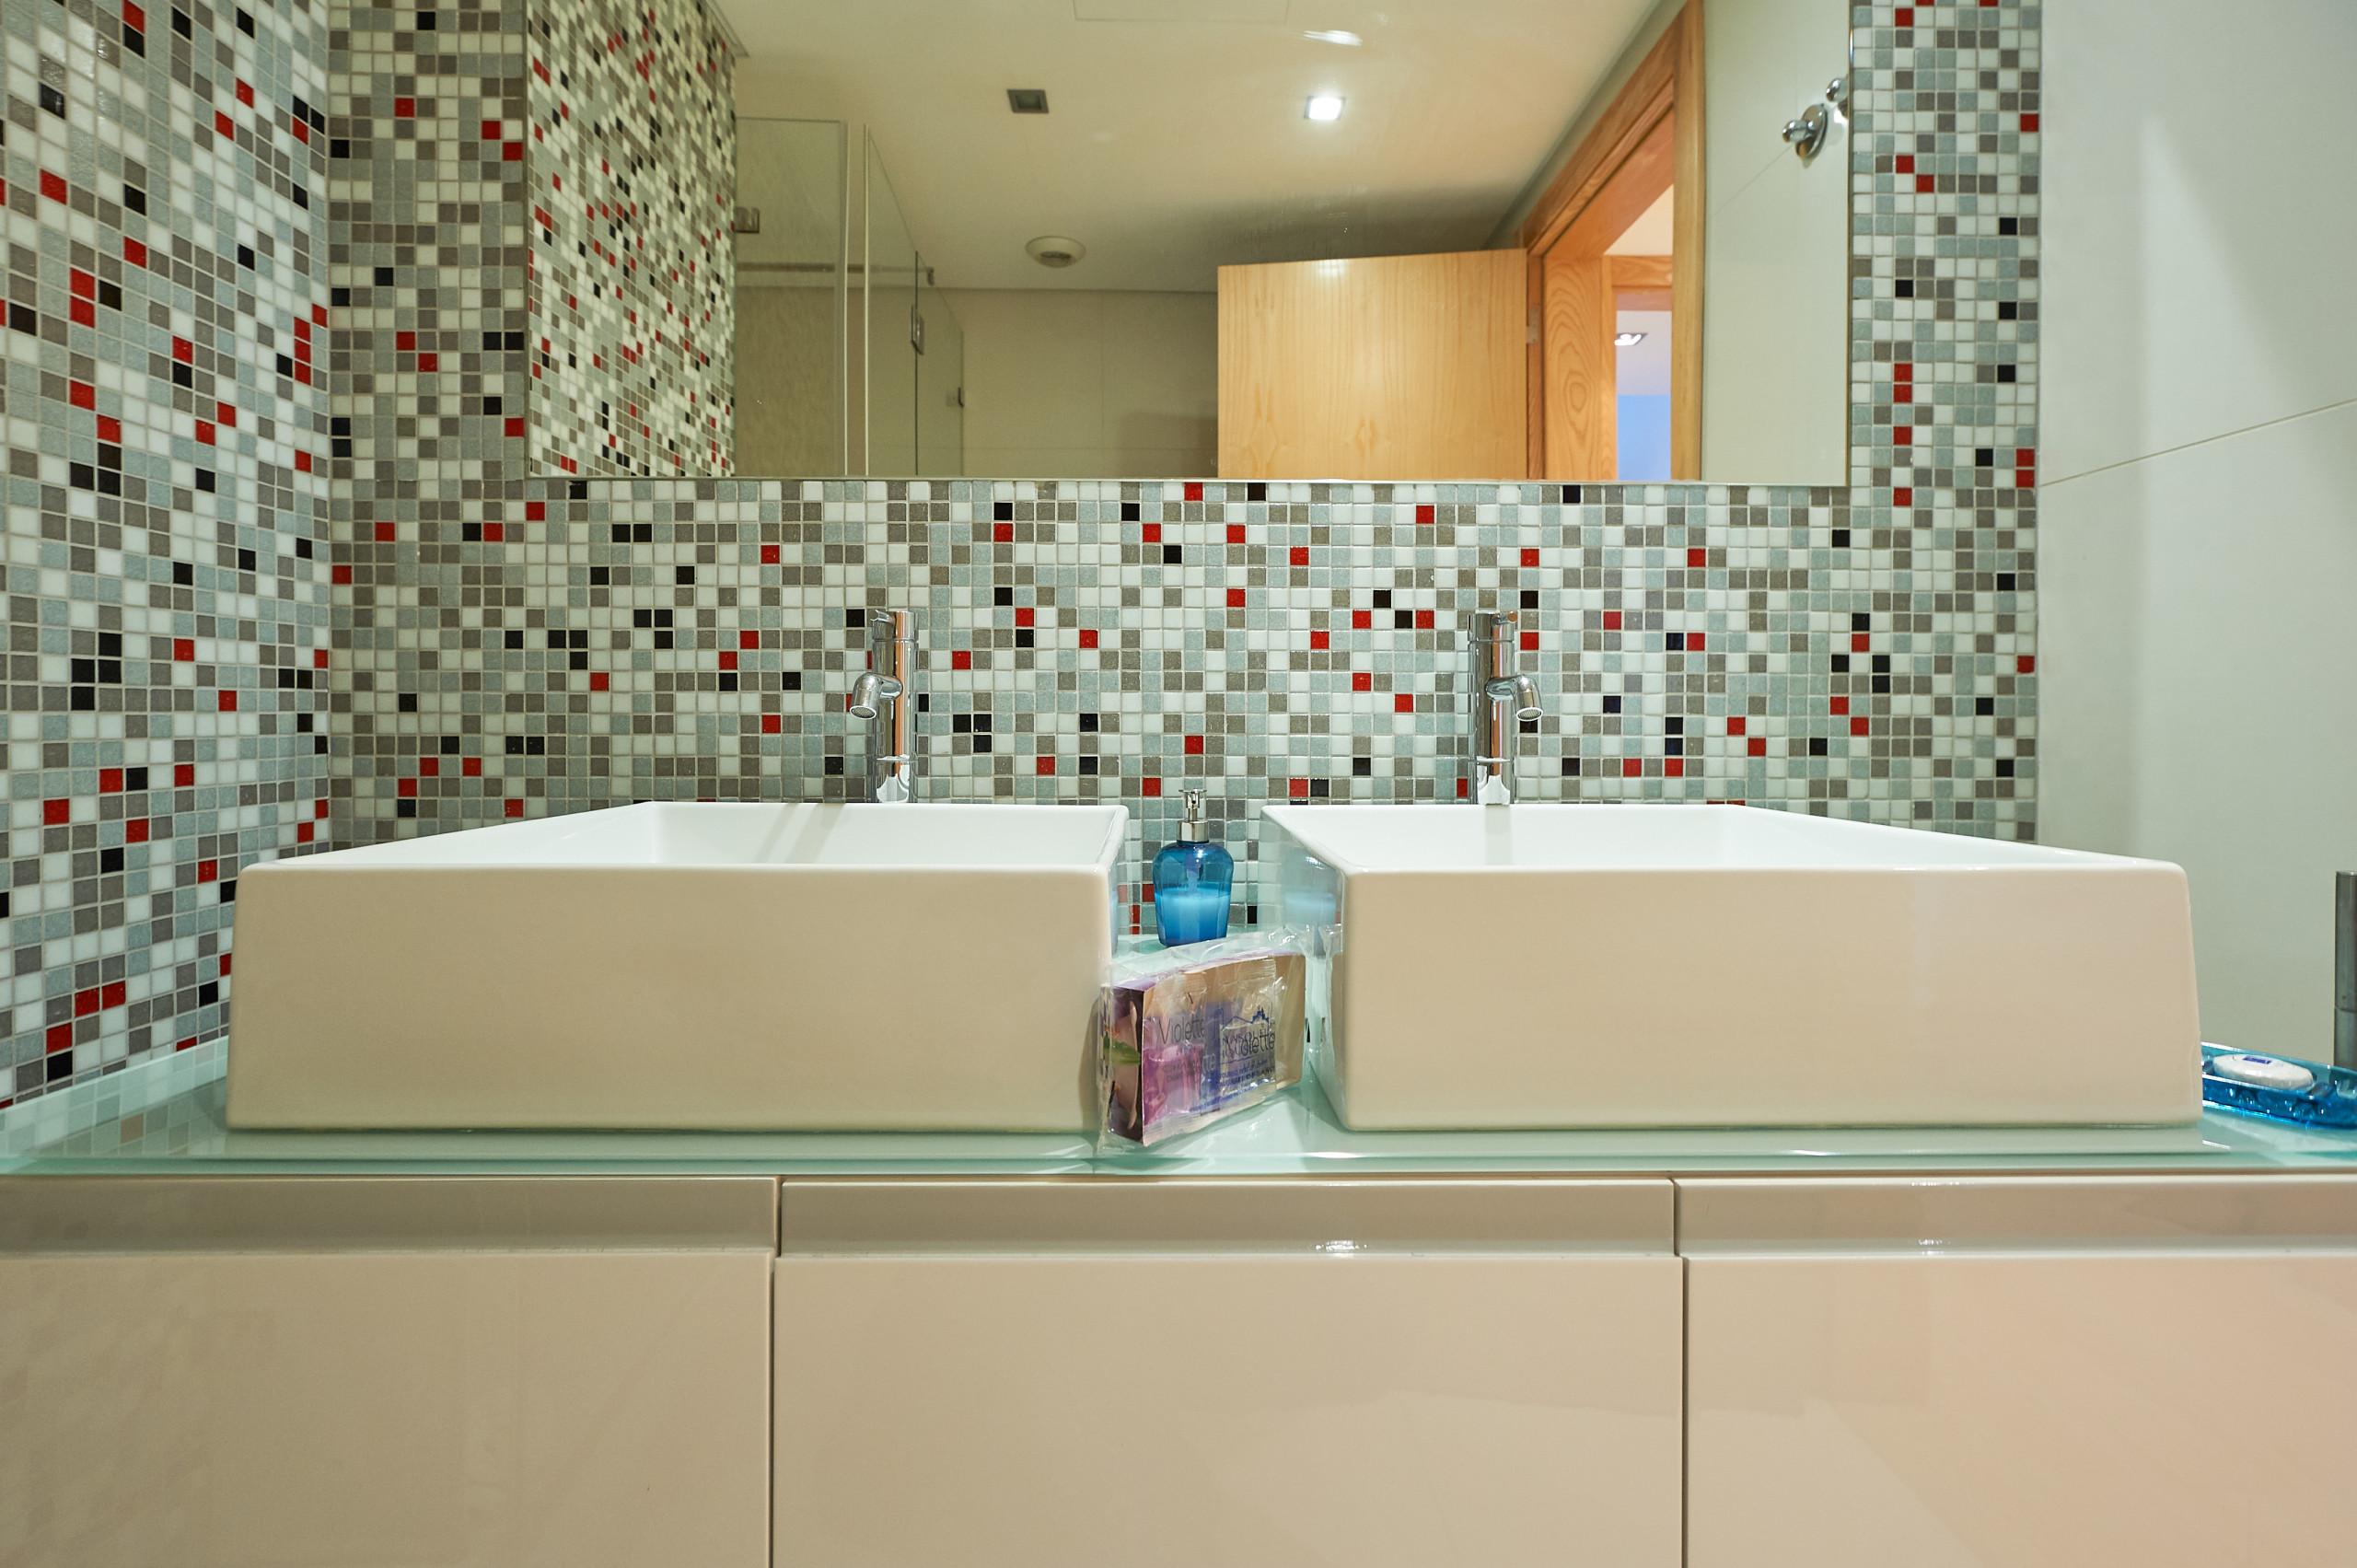 Funky Tub Lifter Ensign - Bathtub Design Ideas - valtak.com